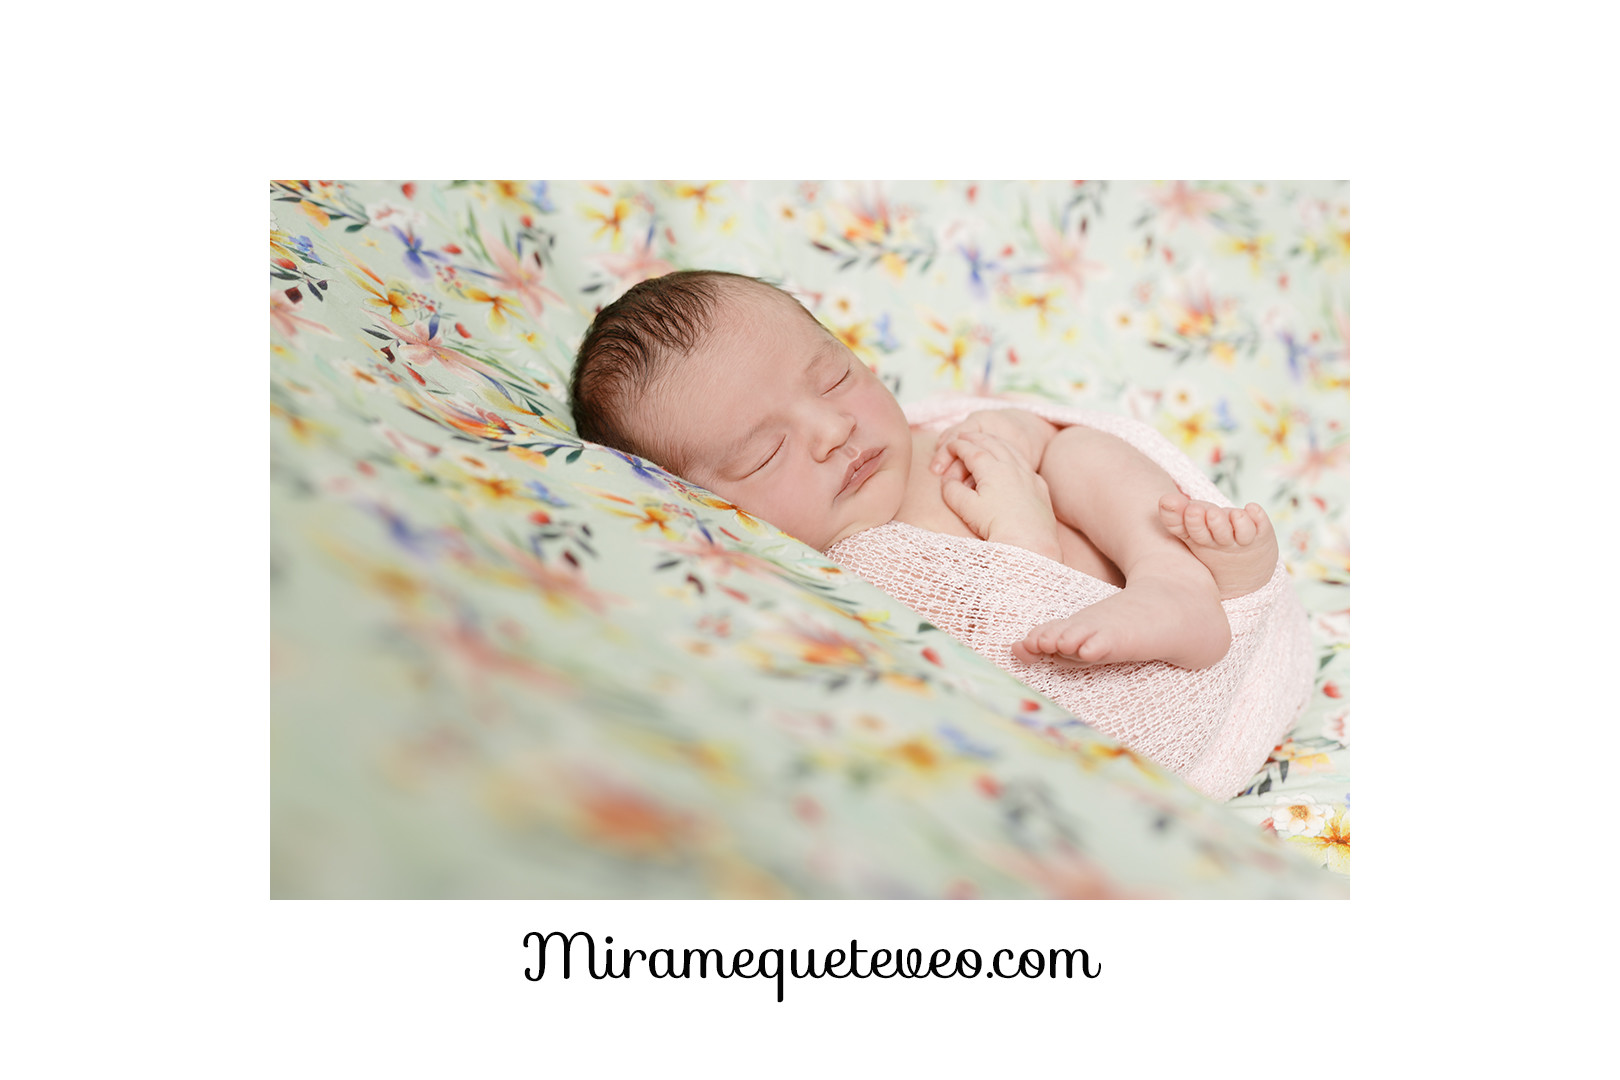 newborn Ariadna 2 MIRAMEQUETEVEO